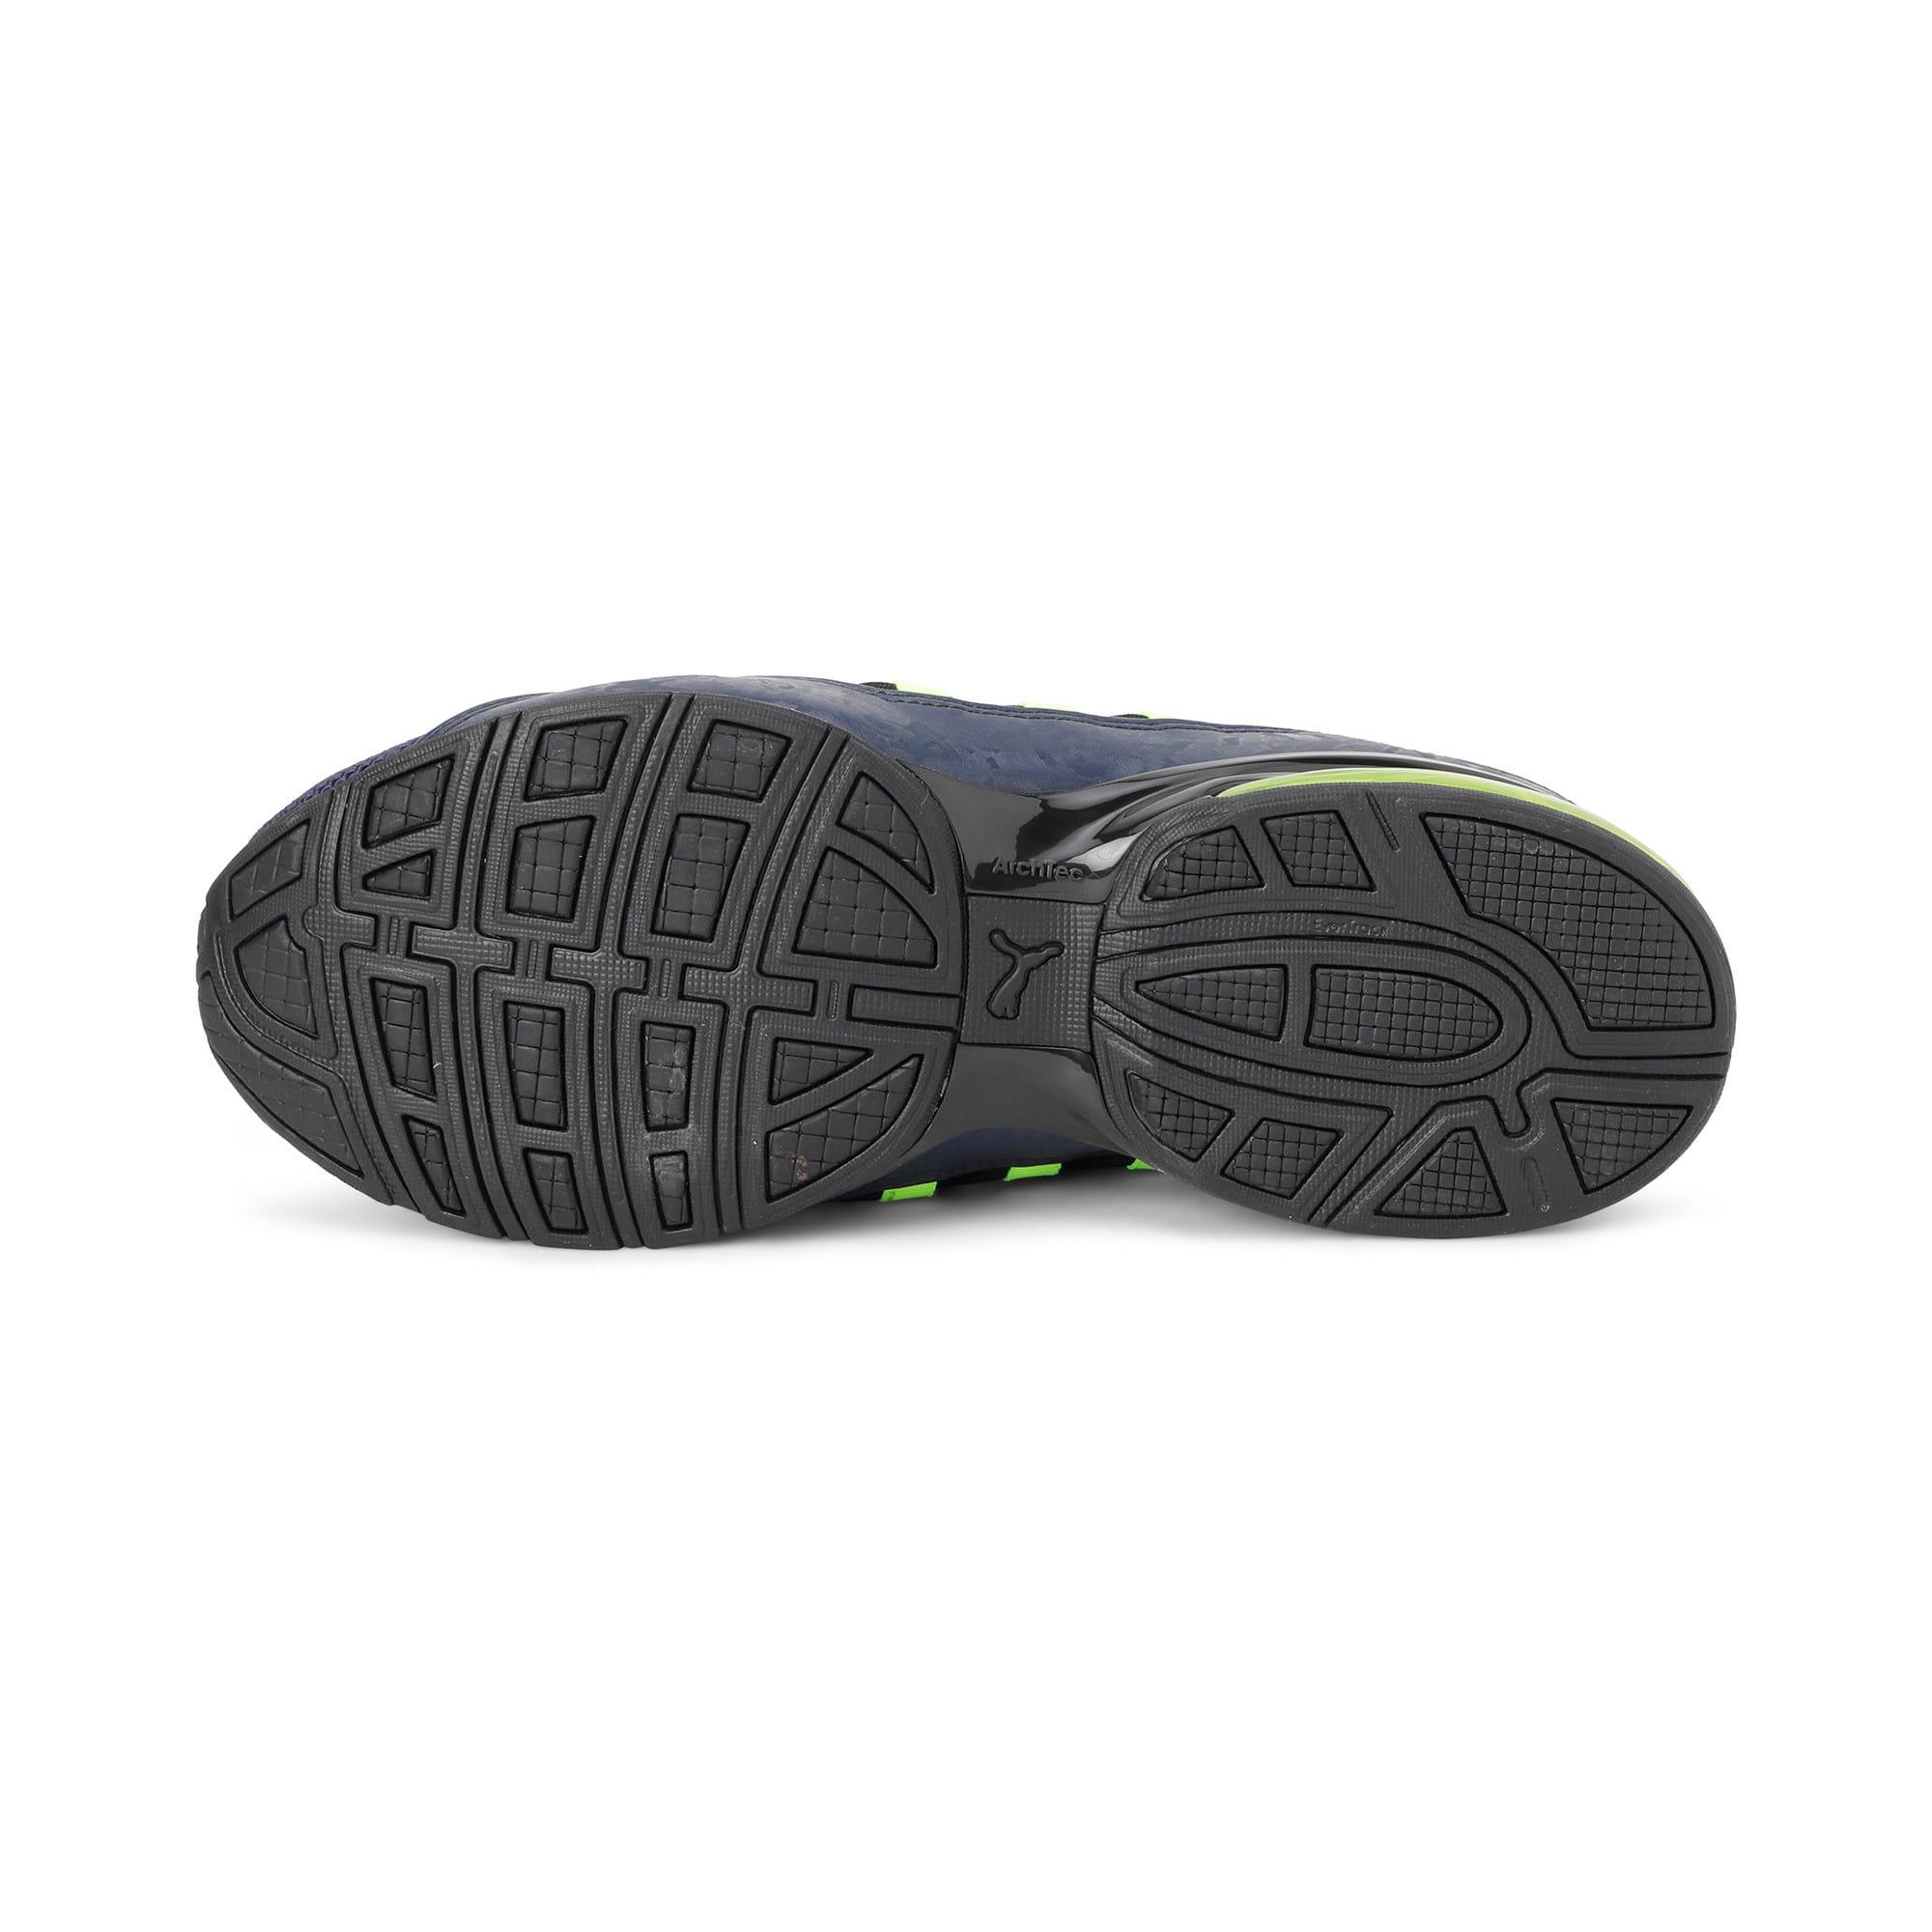 Thumbnail 6 of Cell Regulate Camo Men's Running Shoes, Peacoat-Yellow Alert, medium-IND